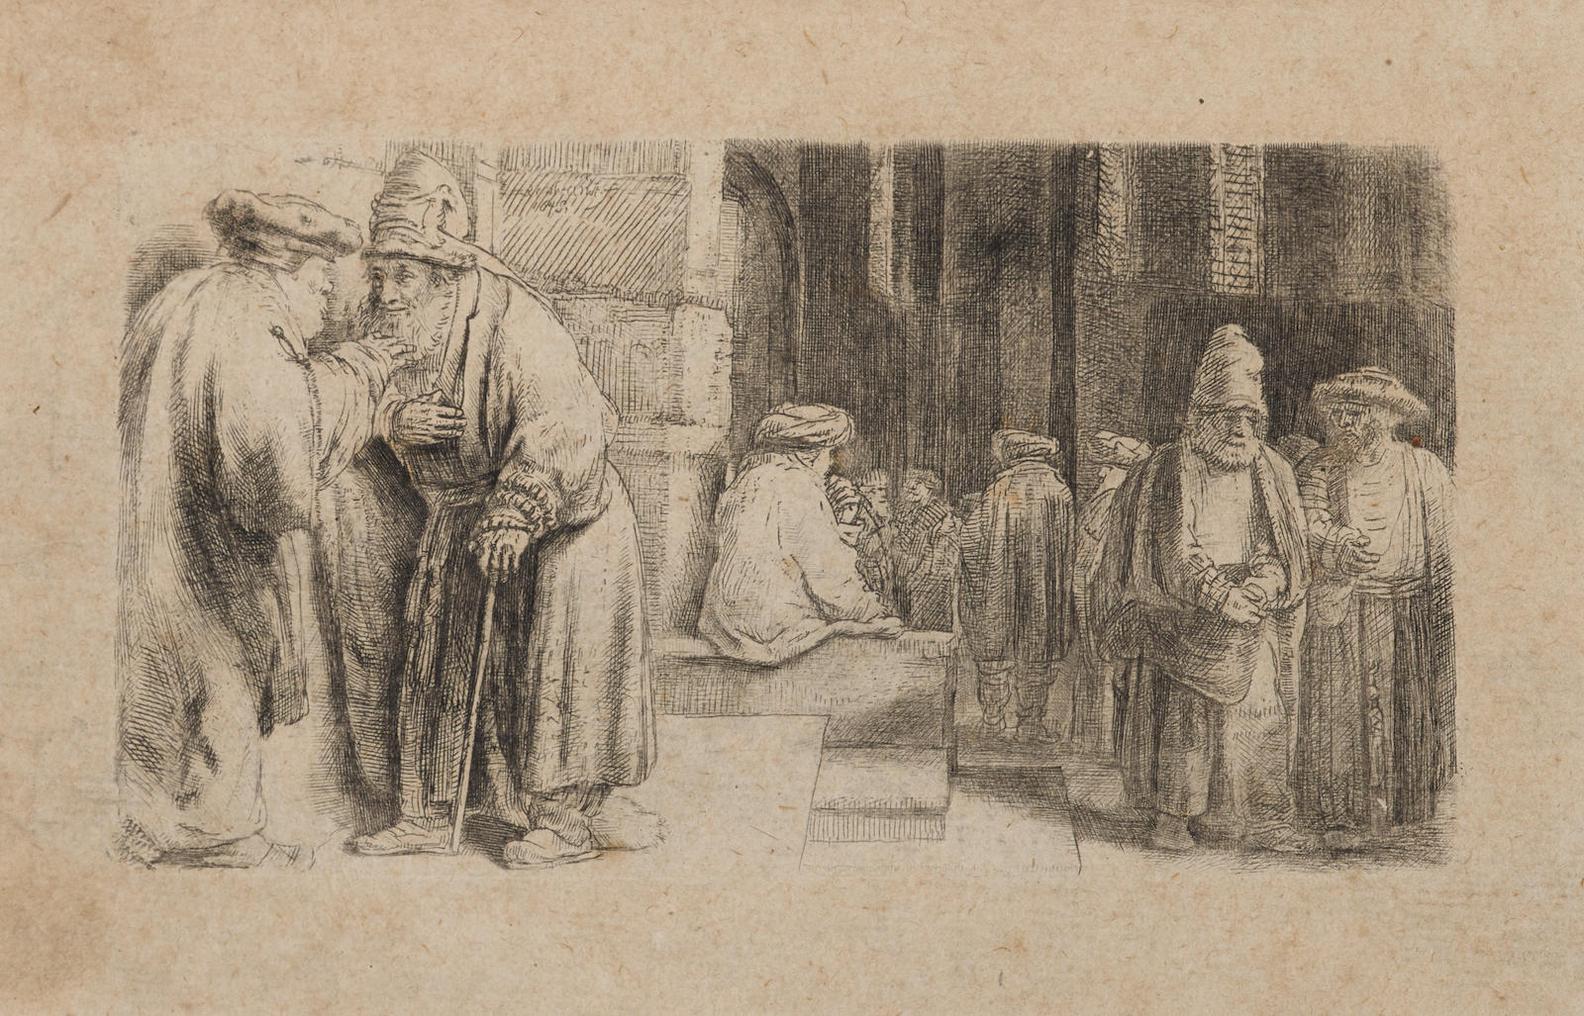 Rembrandt Harmensz Van Rijn - Jews In The Synagogue (B. 126; H. 234; New Holl. 242), 1648-